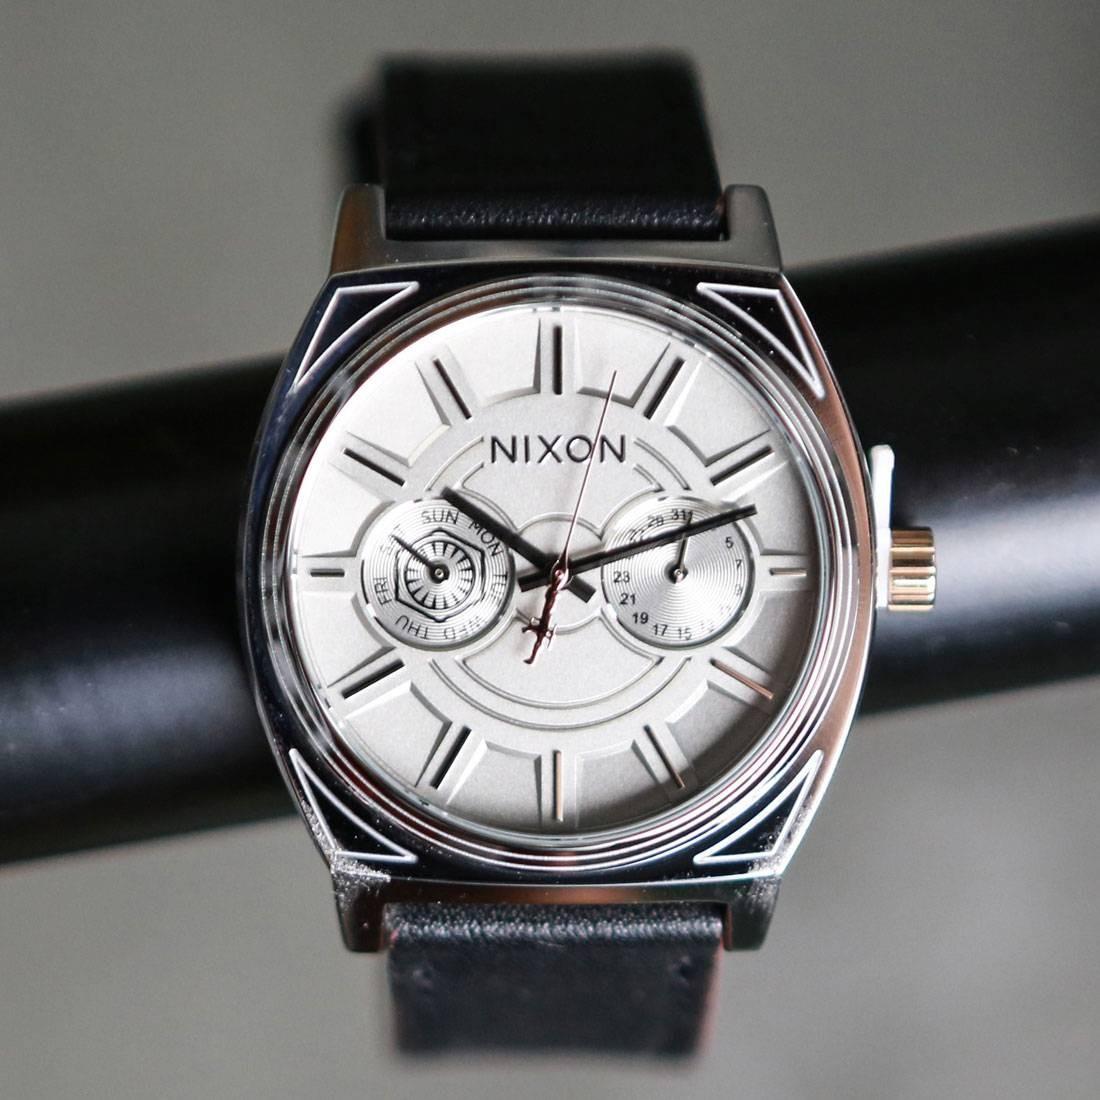 Nixon x Star Wars Time Teller Deluxe Watch - Captain Phasma (silver)